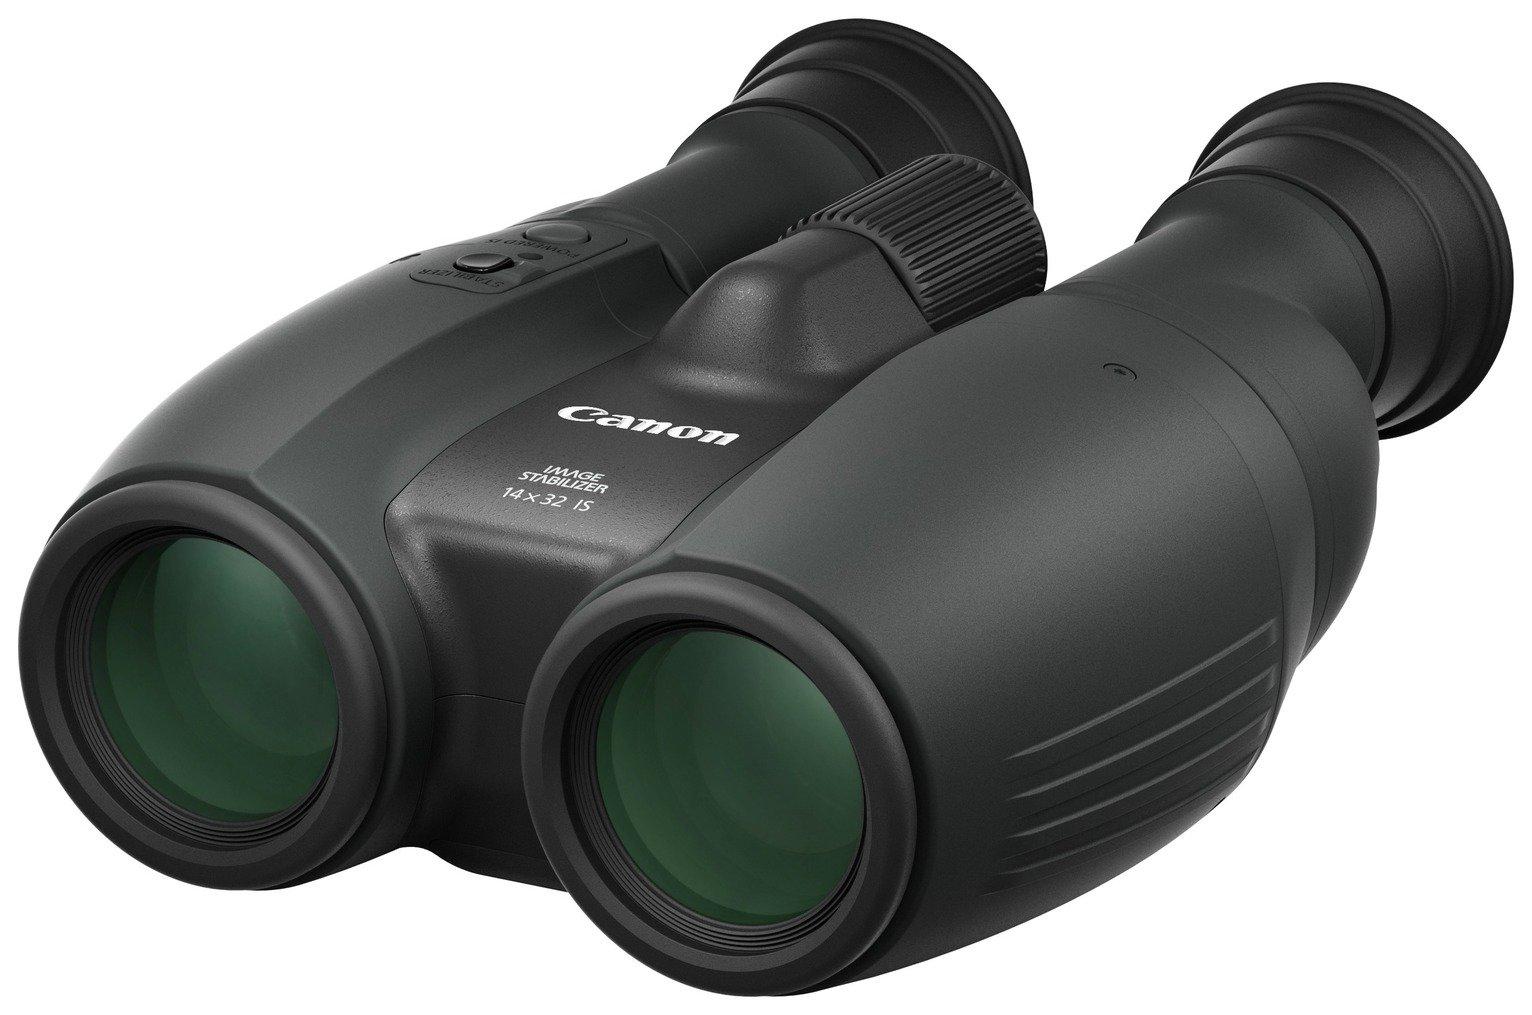 Canon 14 x 32 IS Binoculars